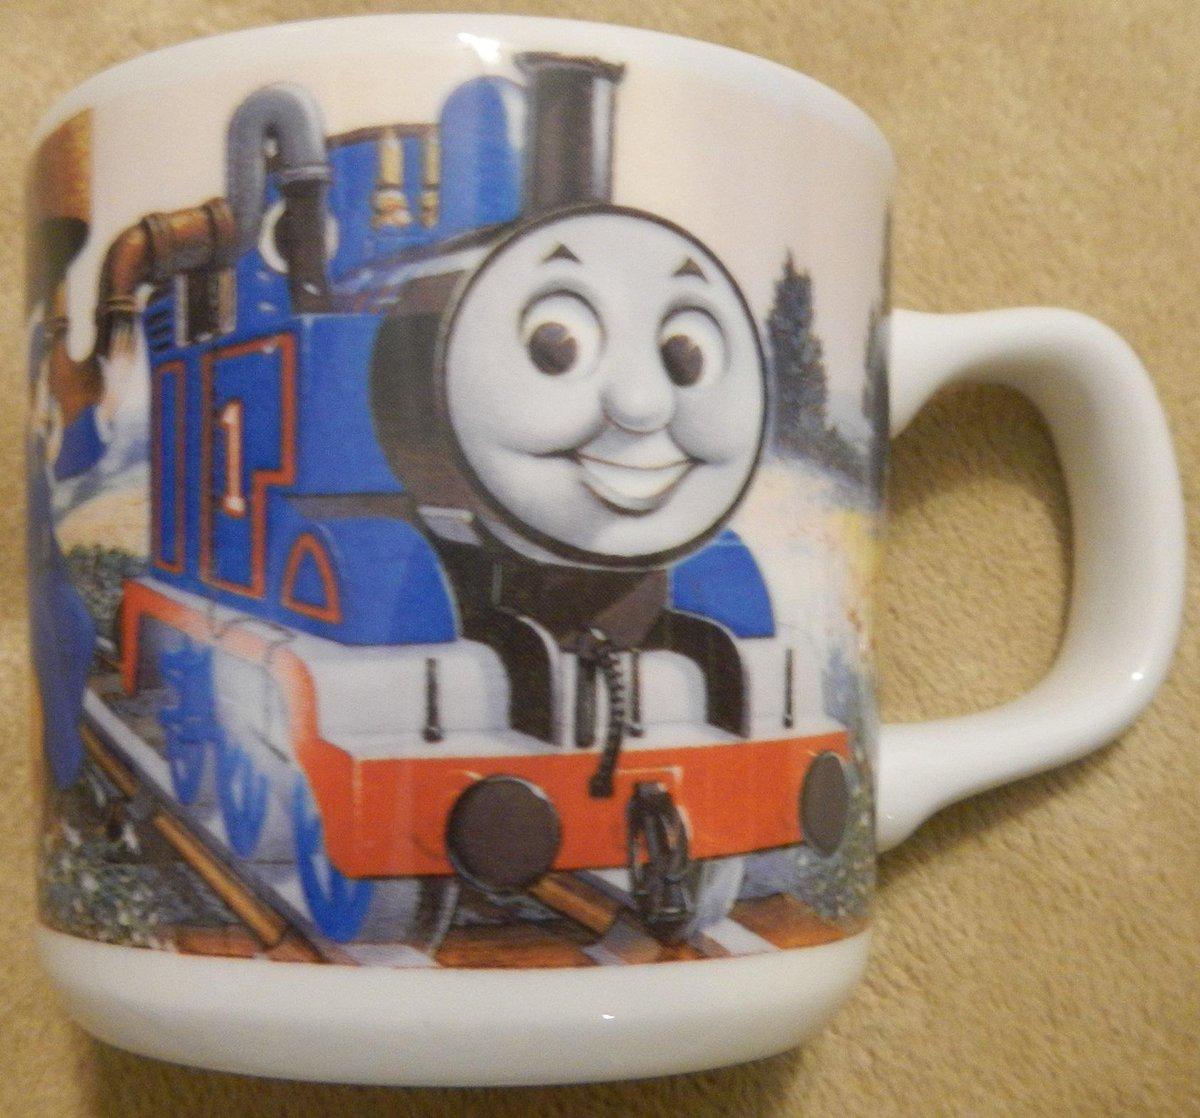 830 PM - 30 Nov 2014 & Thomas Merchandise on Twitter: